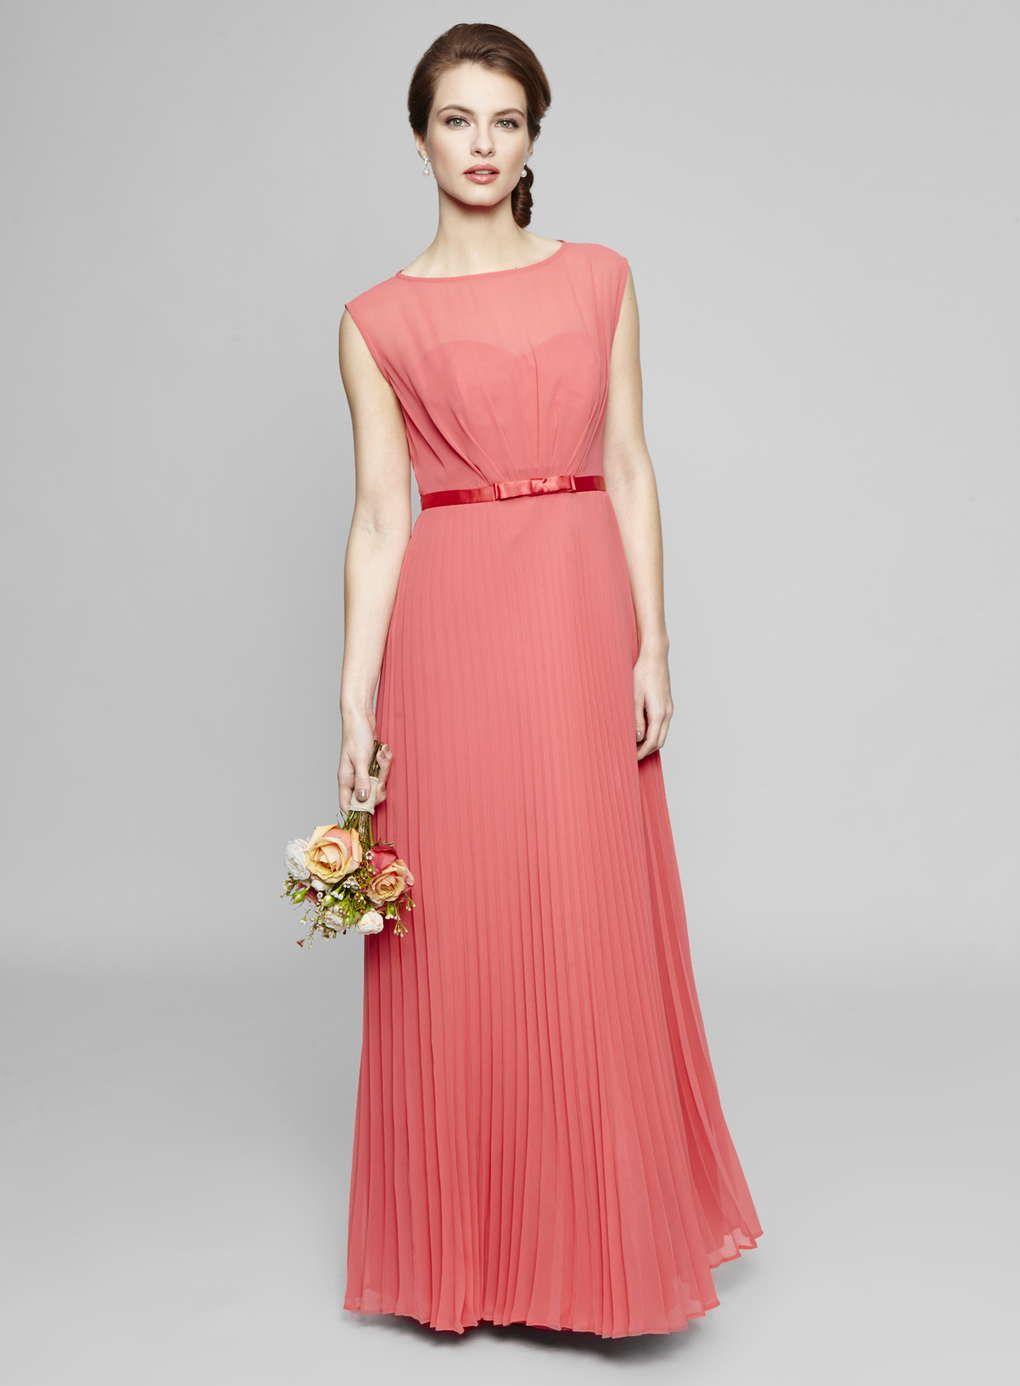 Deep Coral Primrose Pleated Skirt Bridesmaid Dress - BHS | bouquets ...